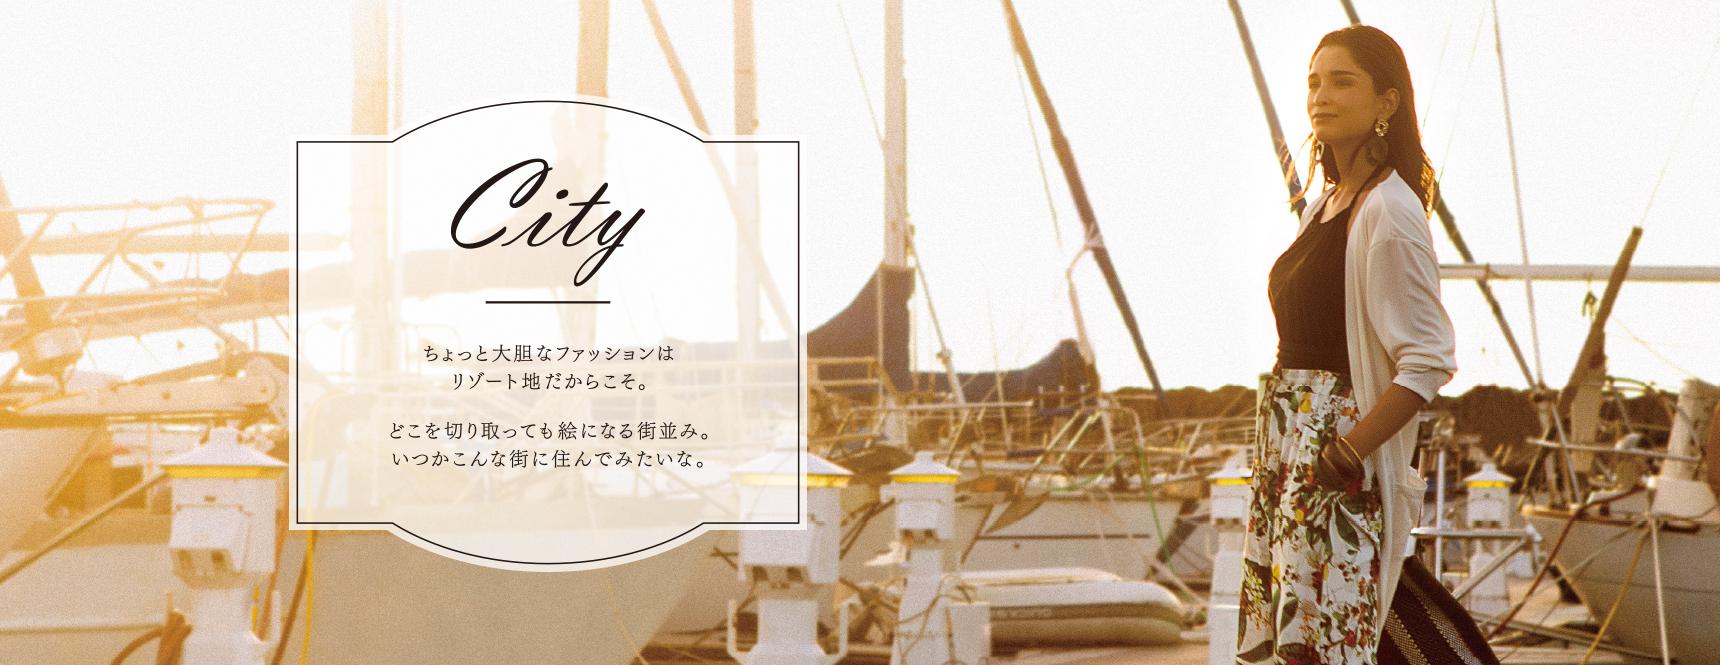 San-ai Resort|City